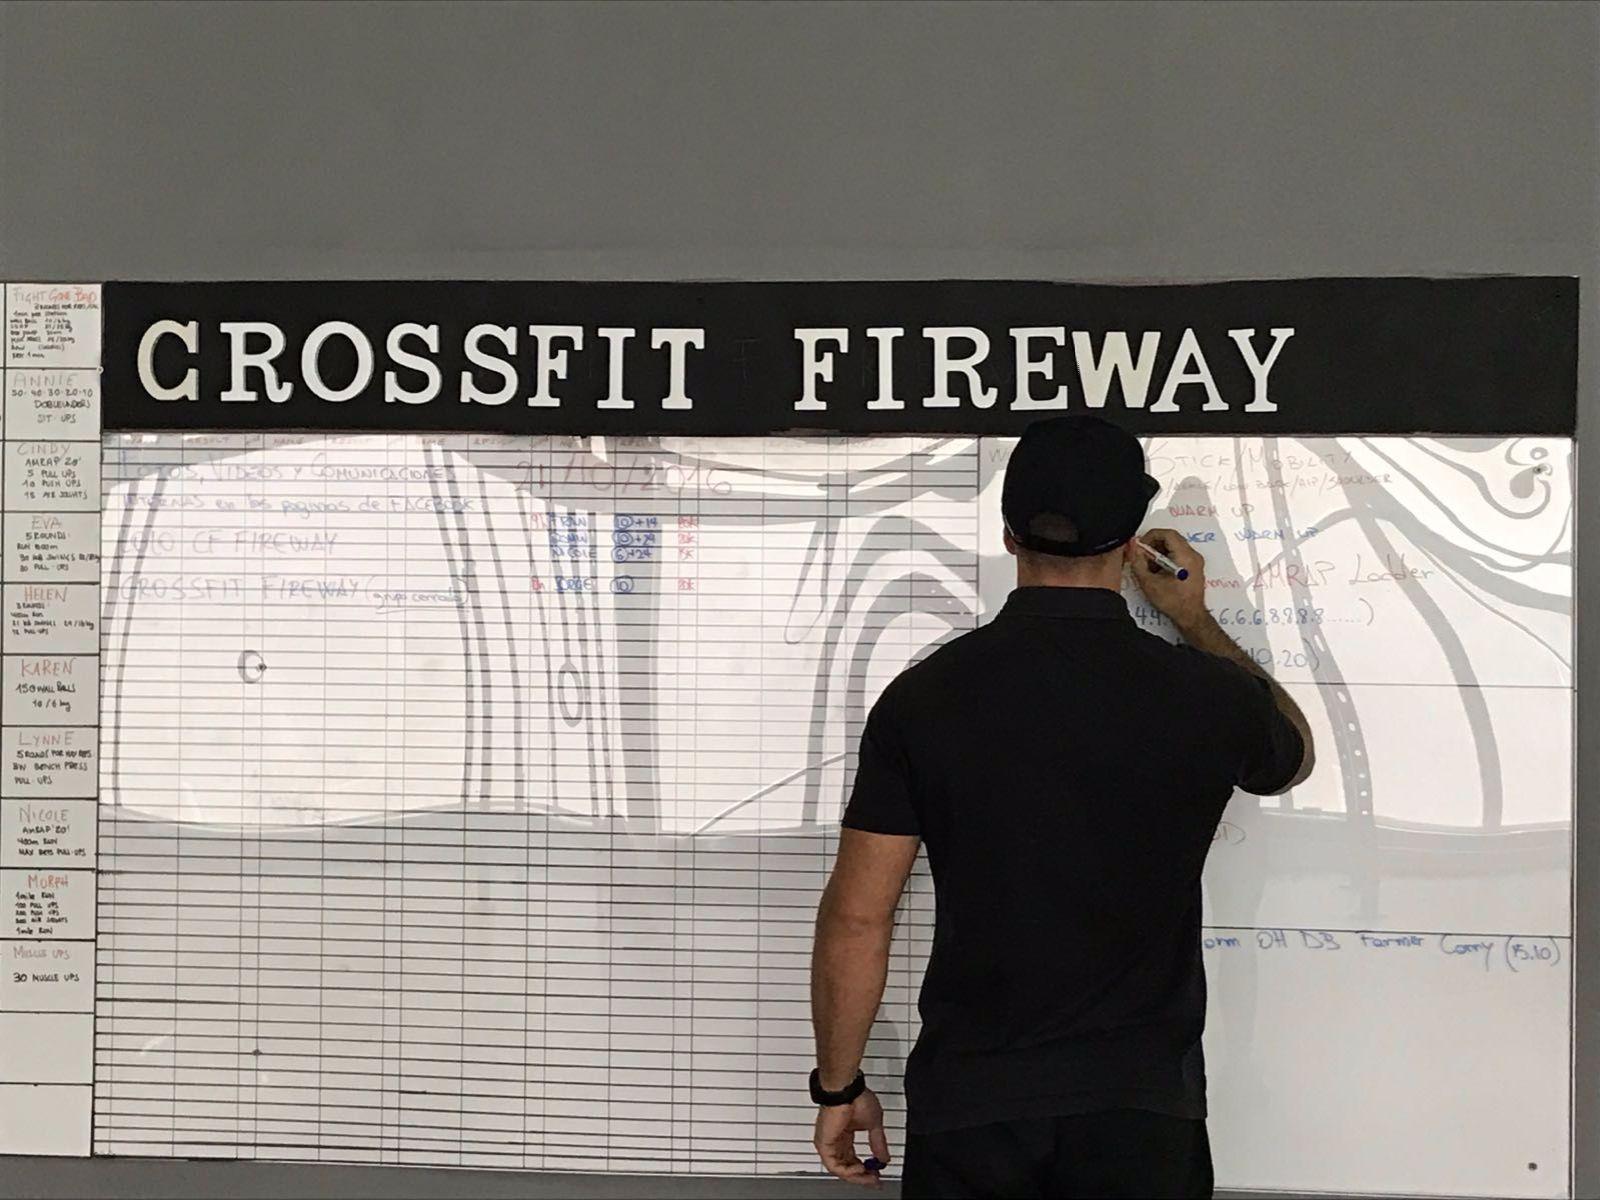 Lolo Crossfitfireway